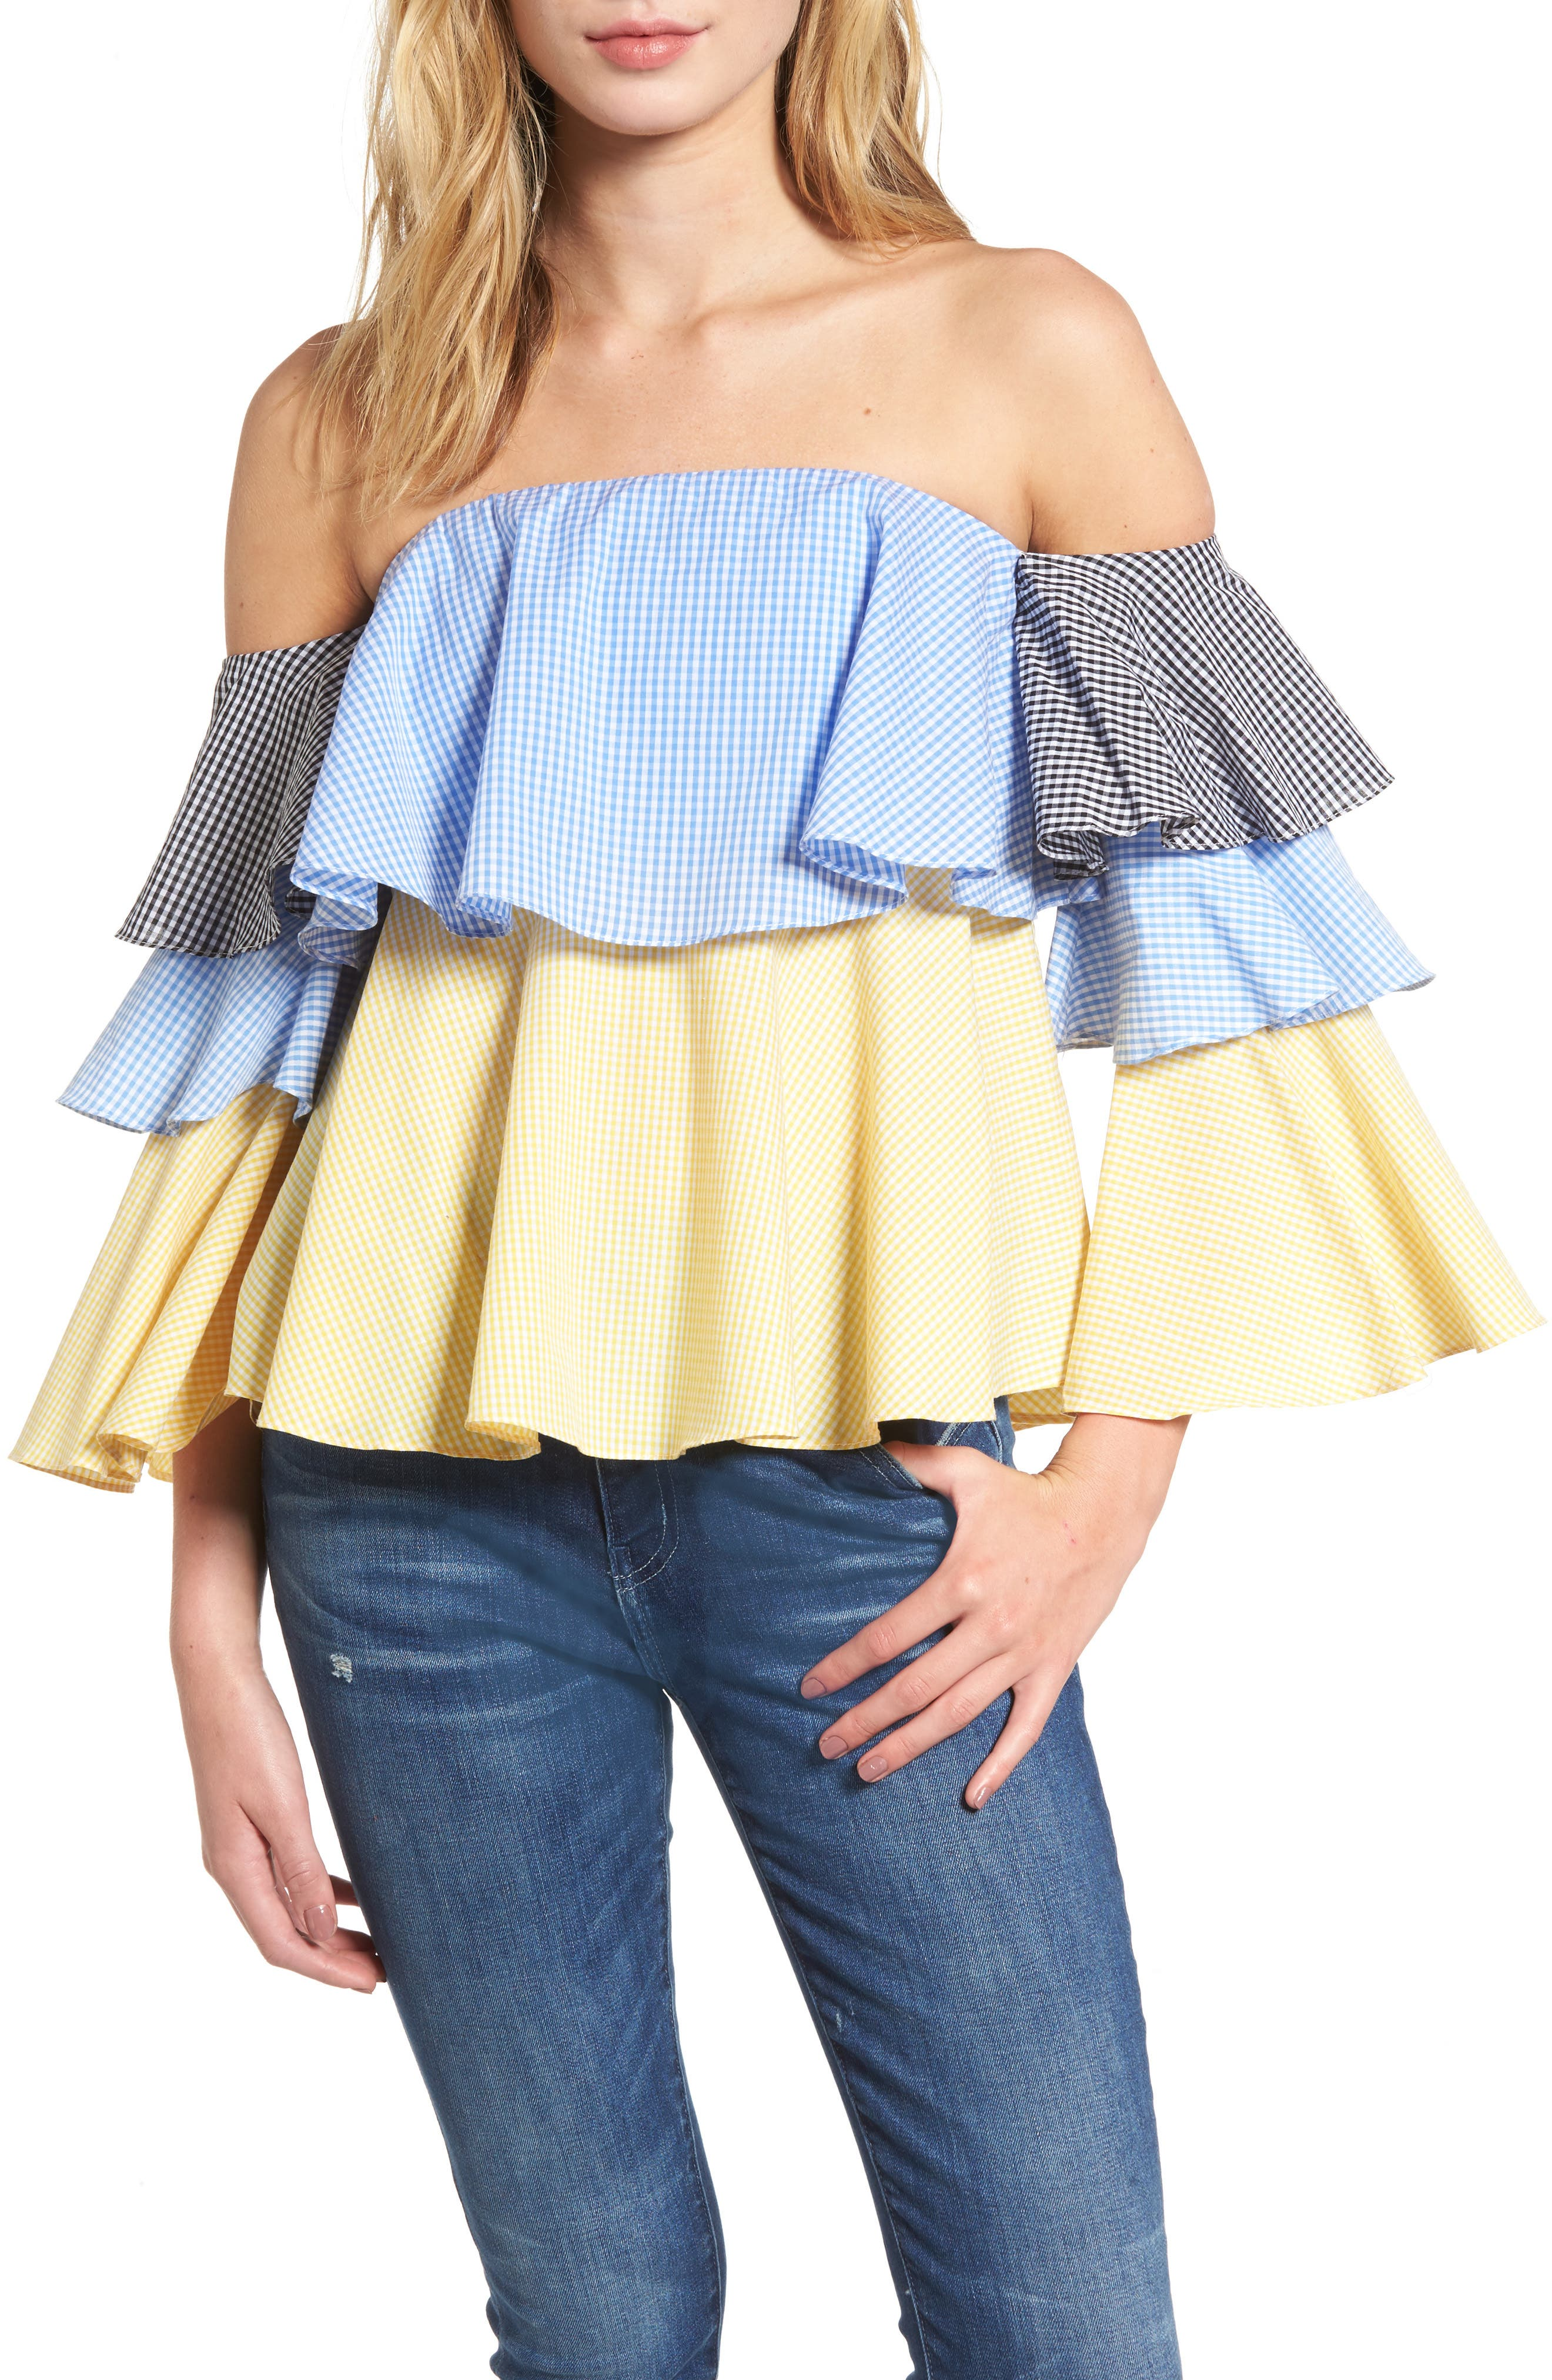 Alternate Image 1 Selected - StyleKeepers The Virgo Ruffle Top